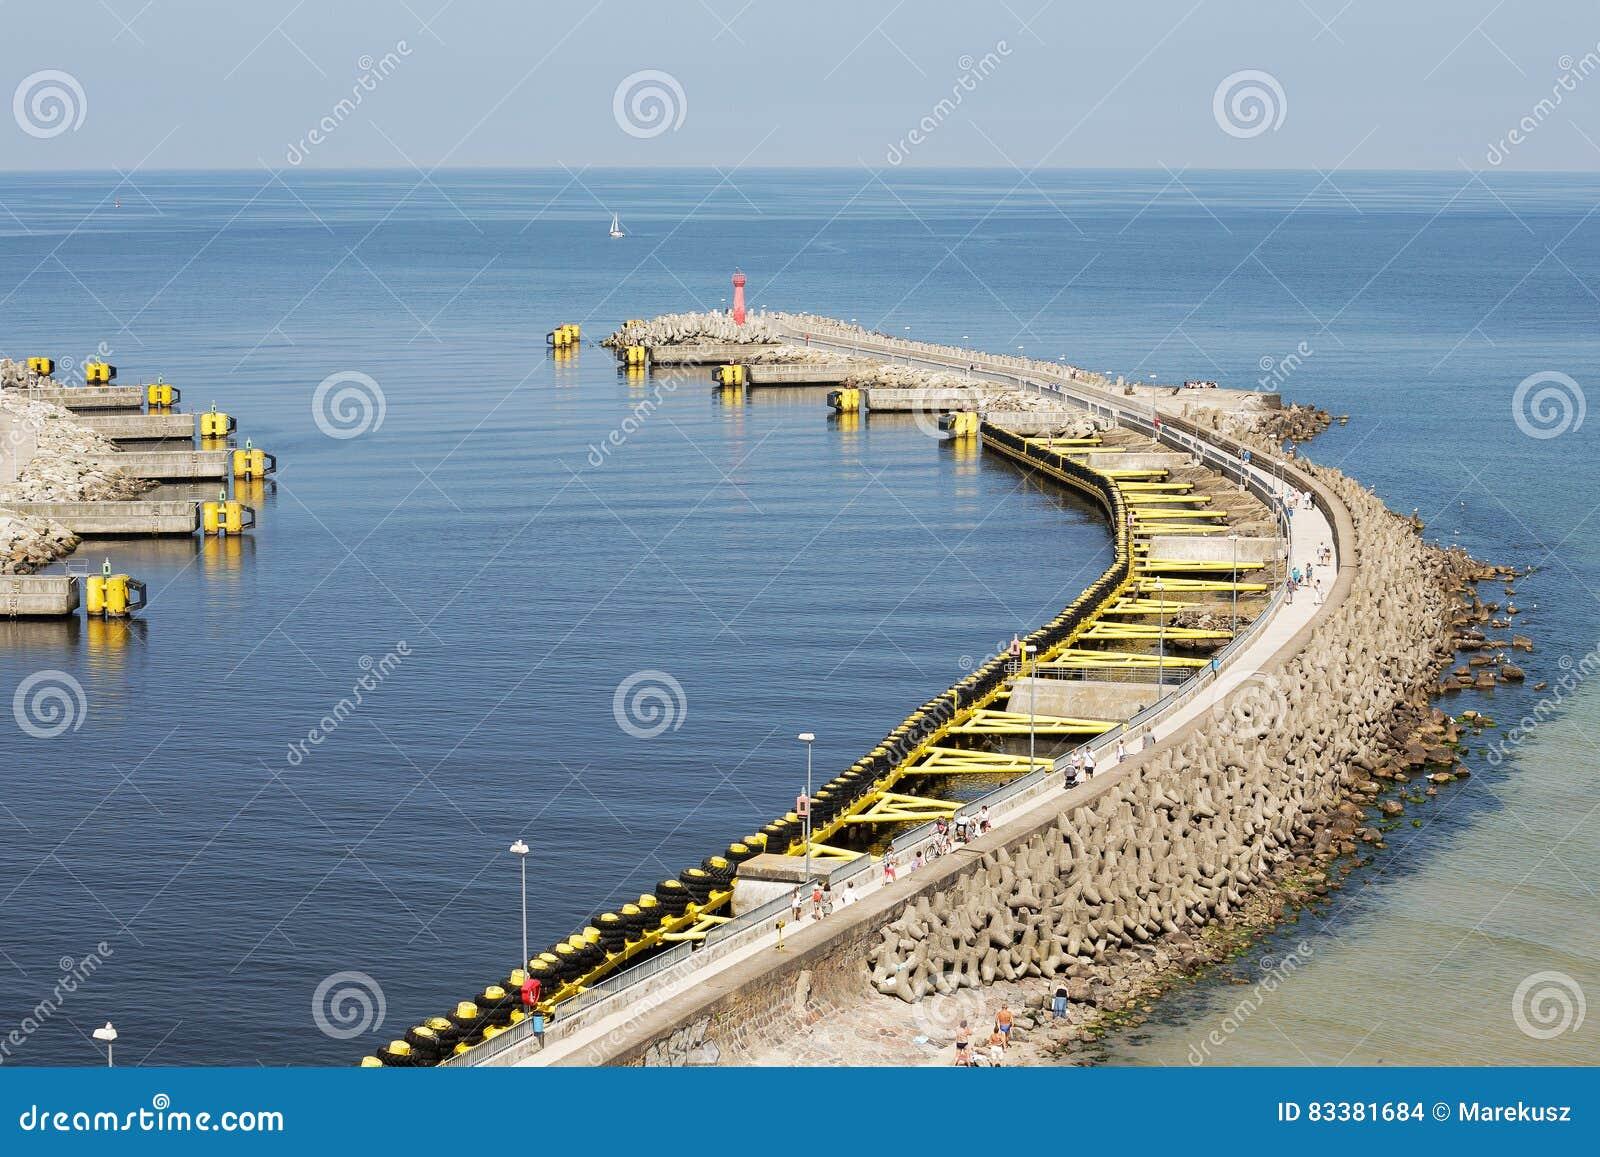 Breakwater Structure